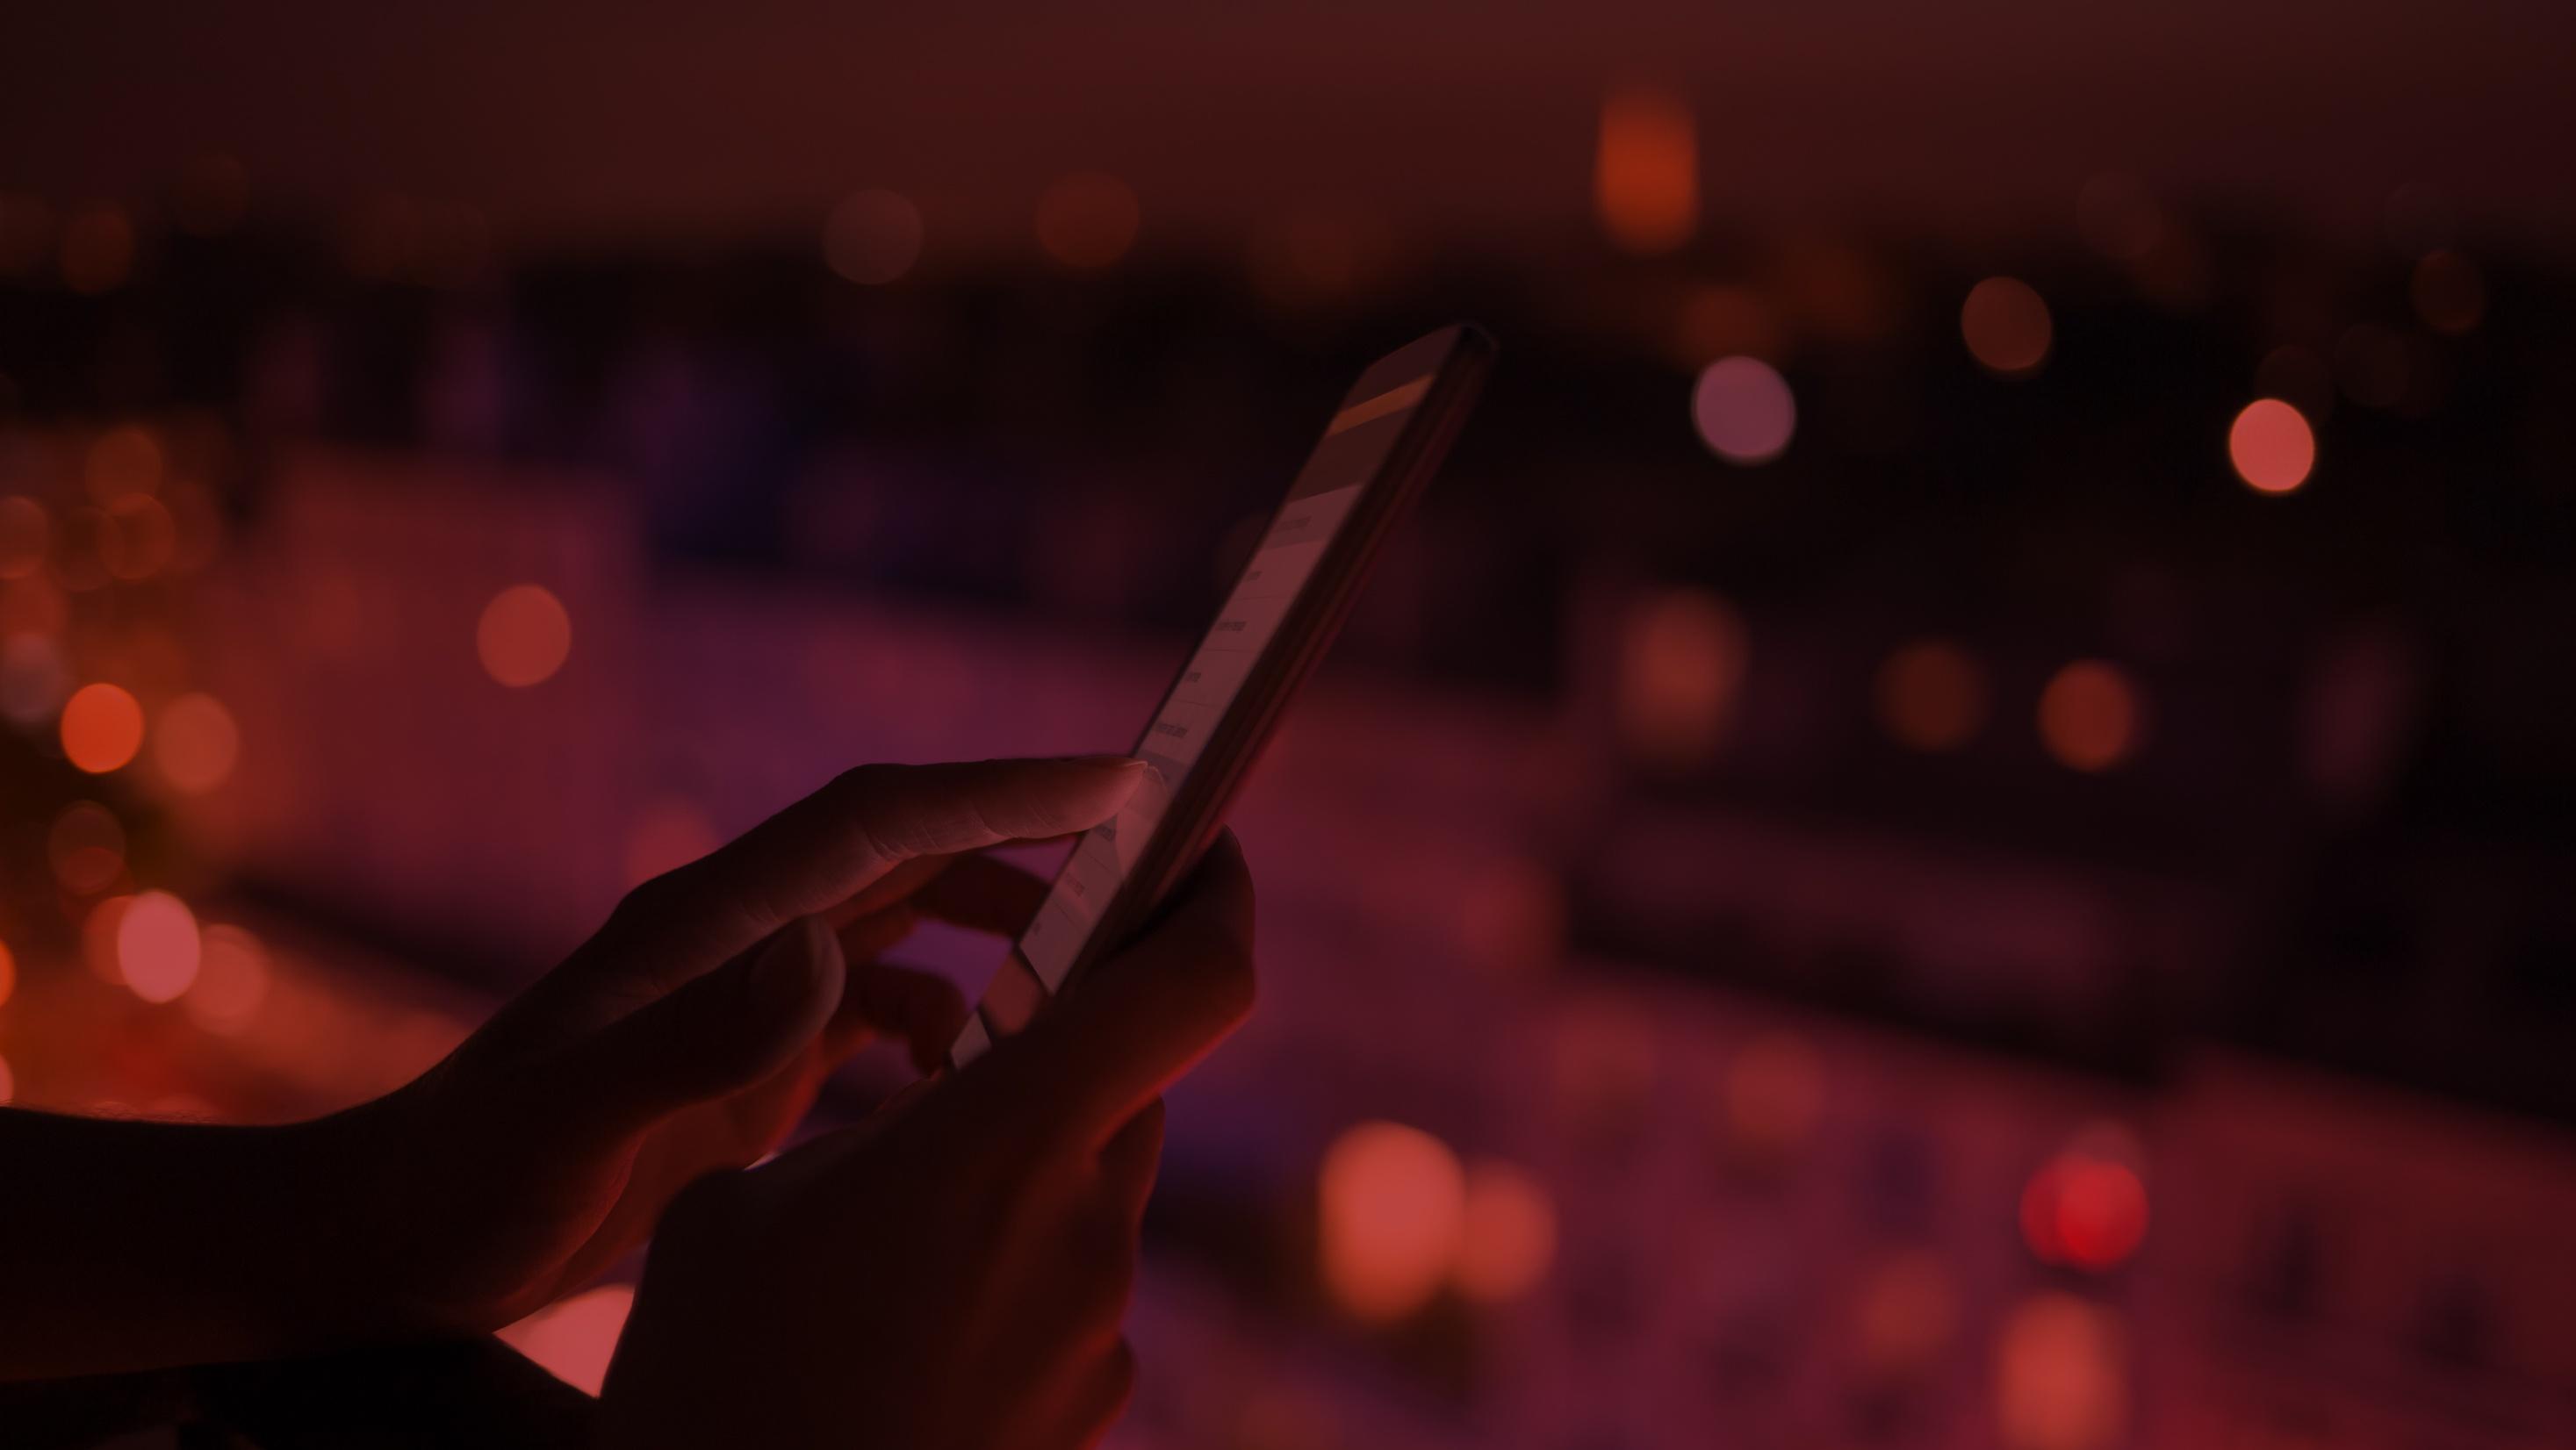 Cellphone-Image2.jpg